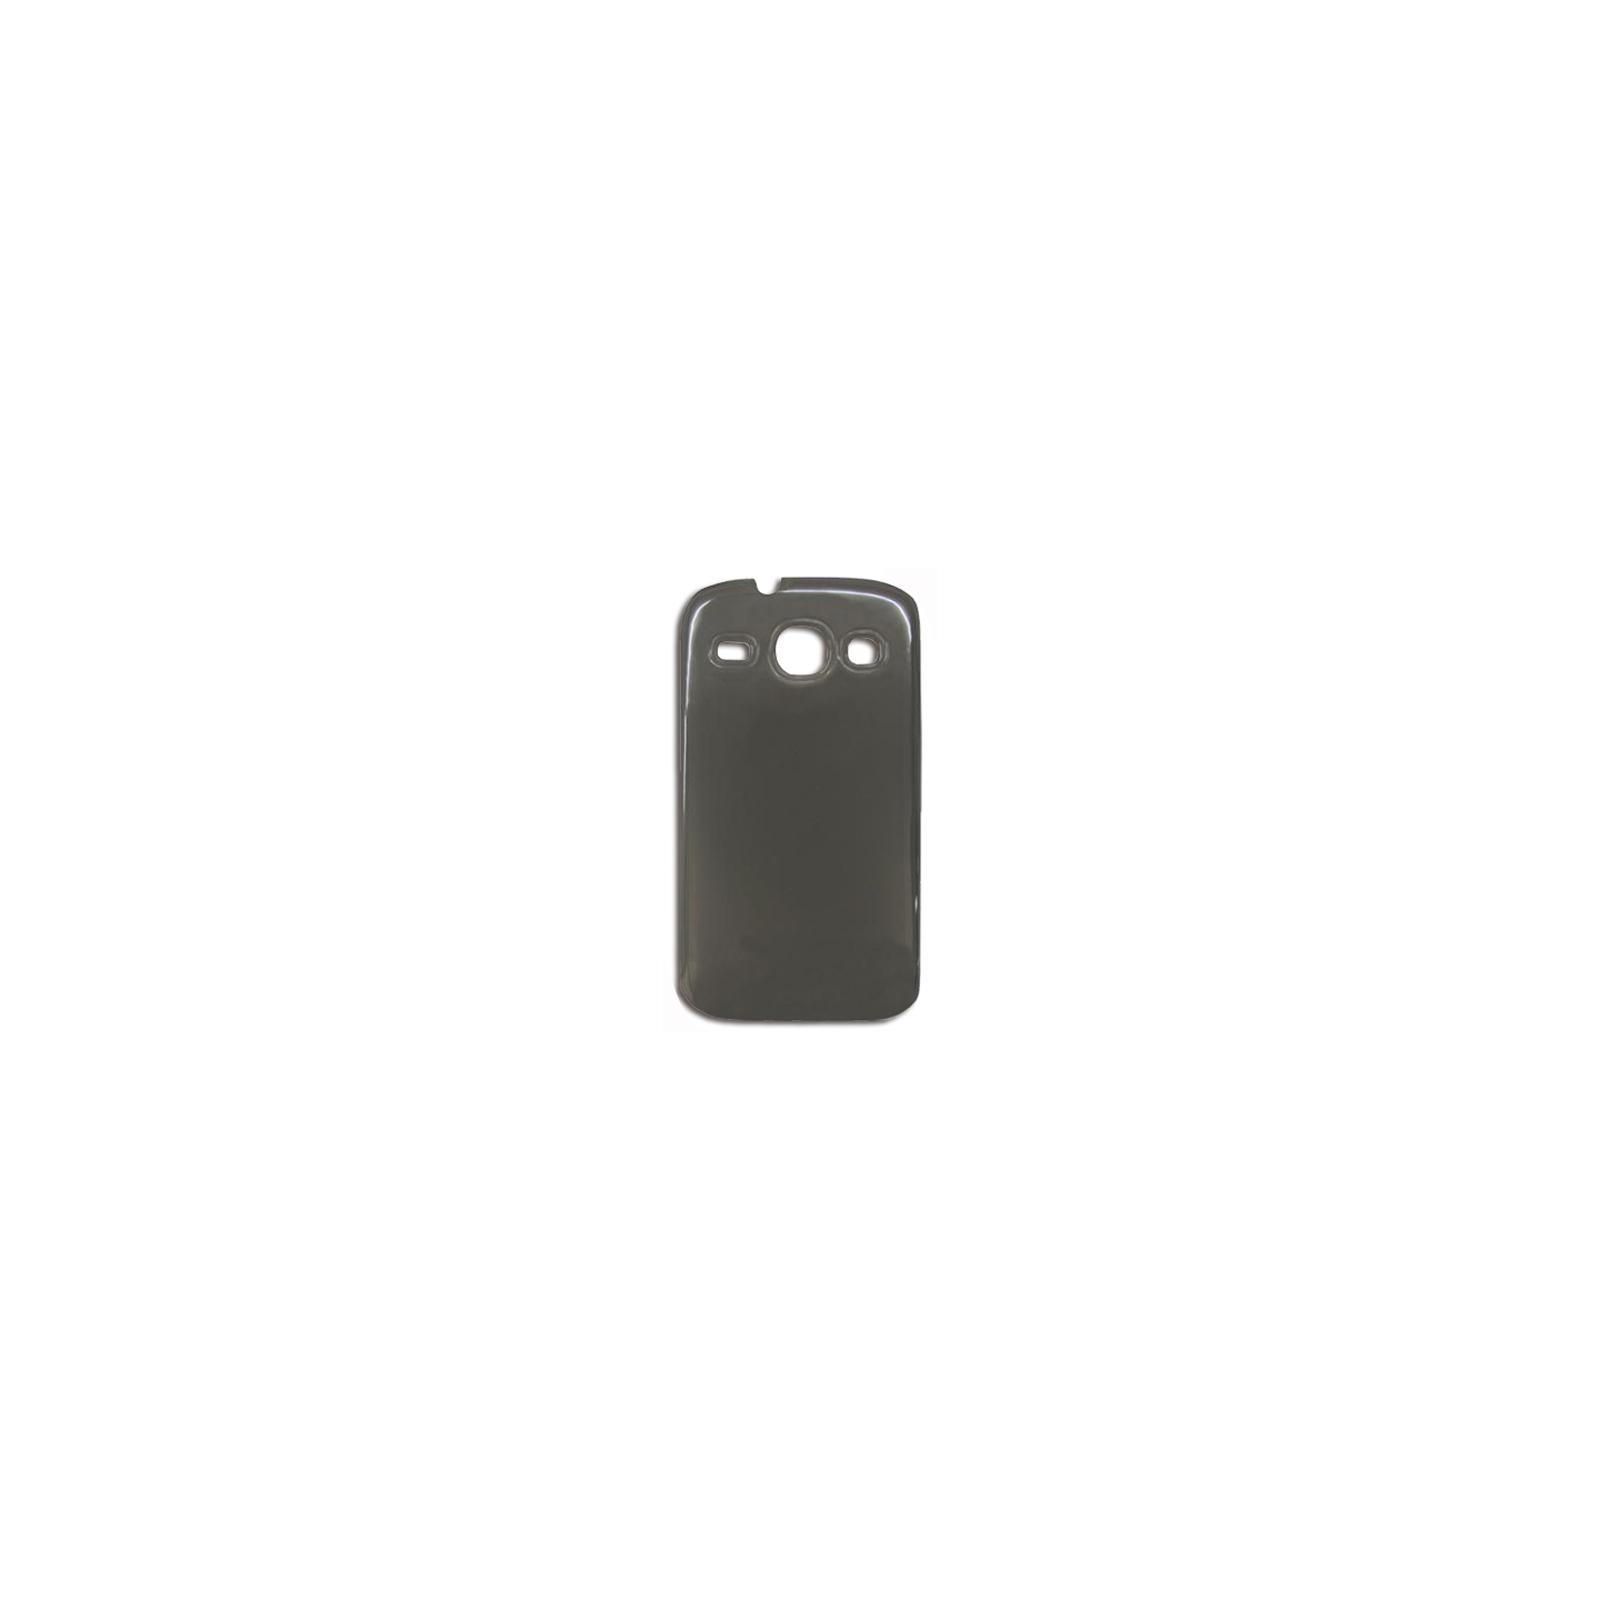 Чехол для моб. телефона Simply Design Samsung S7272 Ace3 /TPU Black (SD-2366)